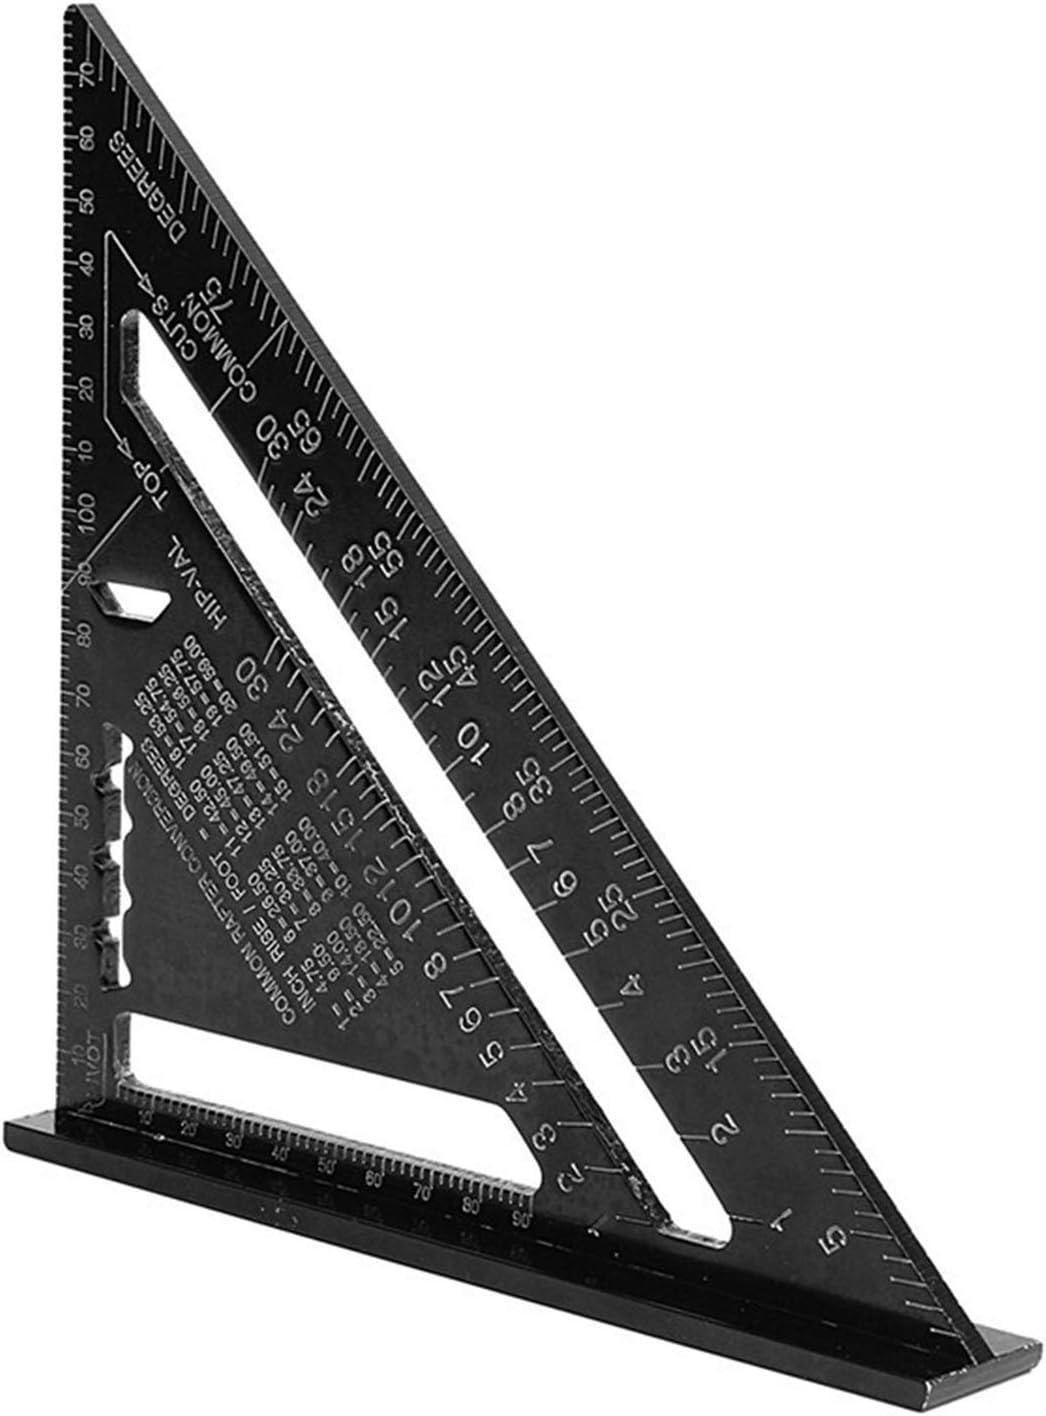 KJBGS High Precision Triangular Me 260x185x185mm New mail order Ruler discount Measuring